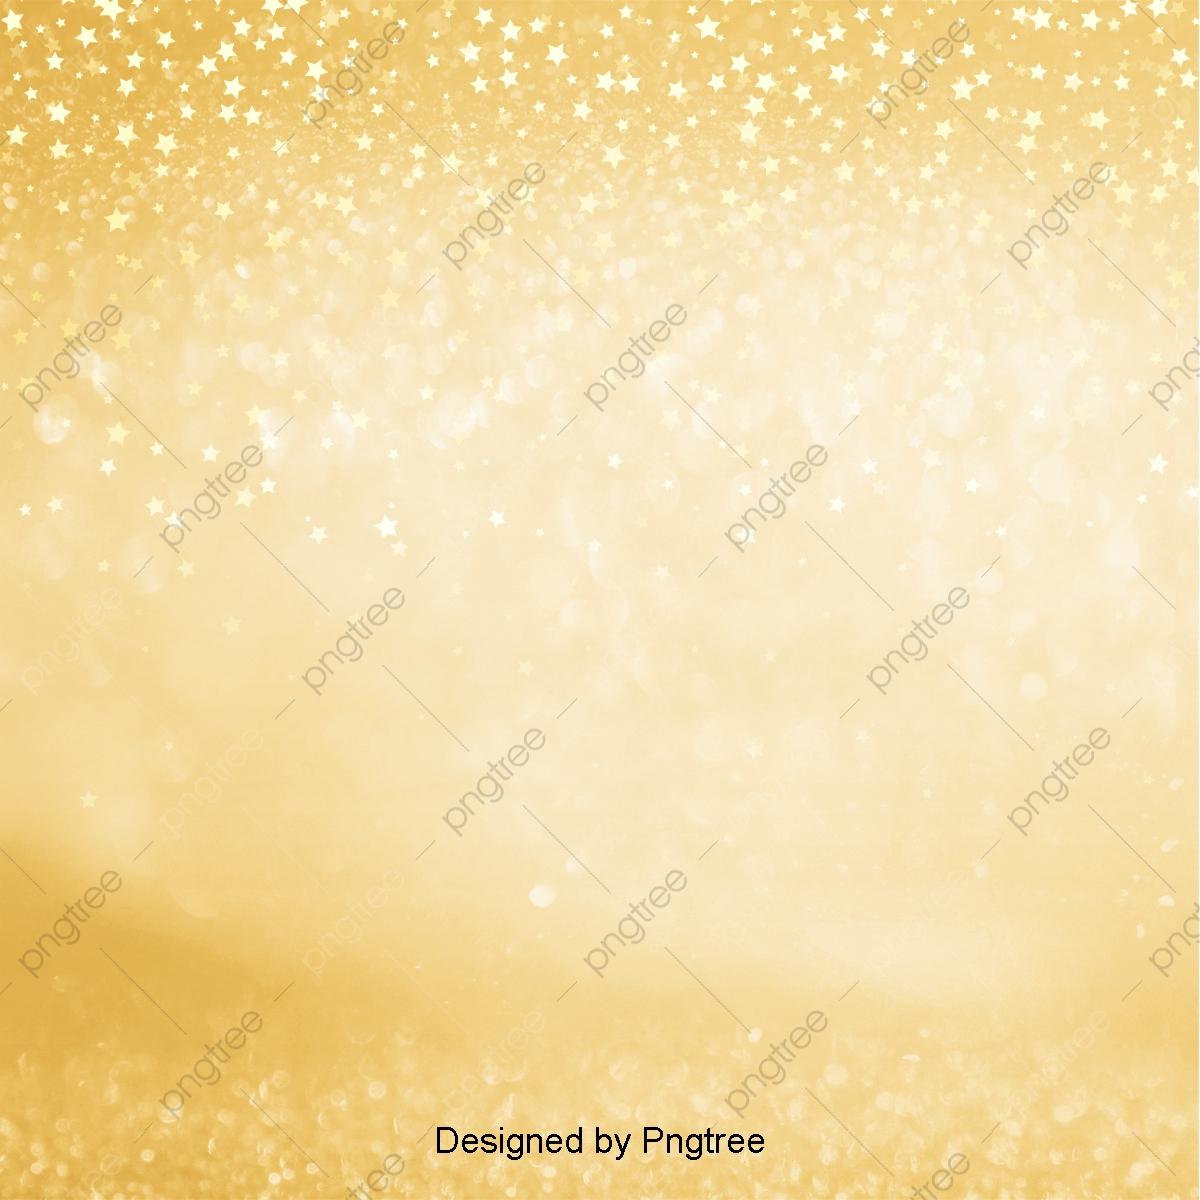 Golden Sprinkler Background Wallpaper Style Design, Light And Shadow.